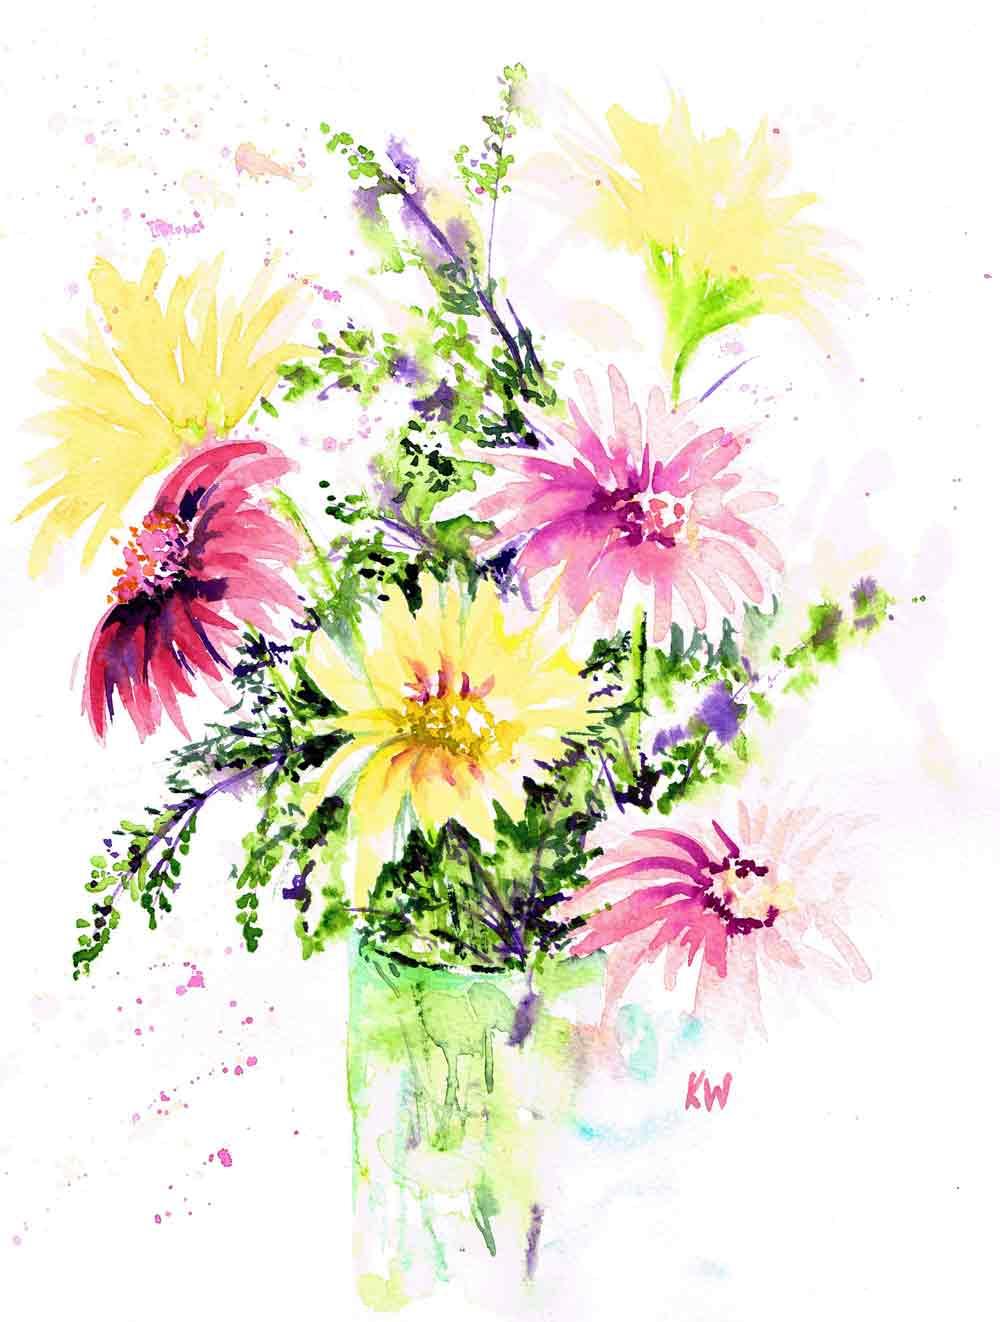 Fresh-flowers-scan-no-1-kw.jpg